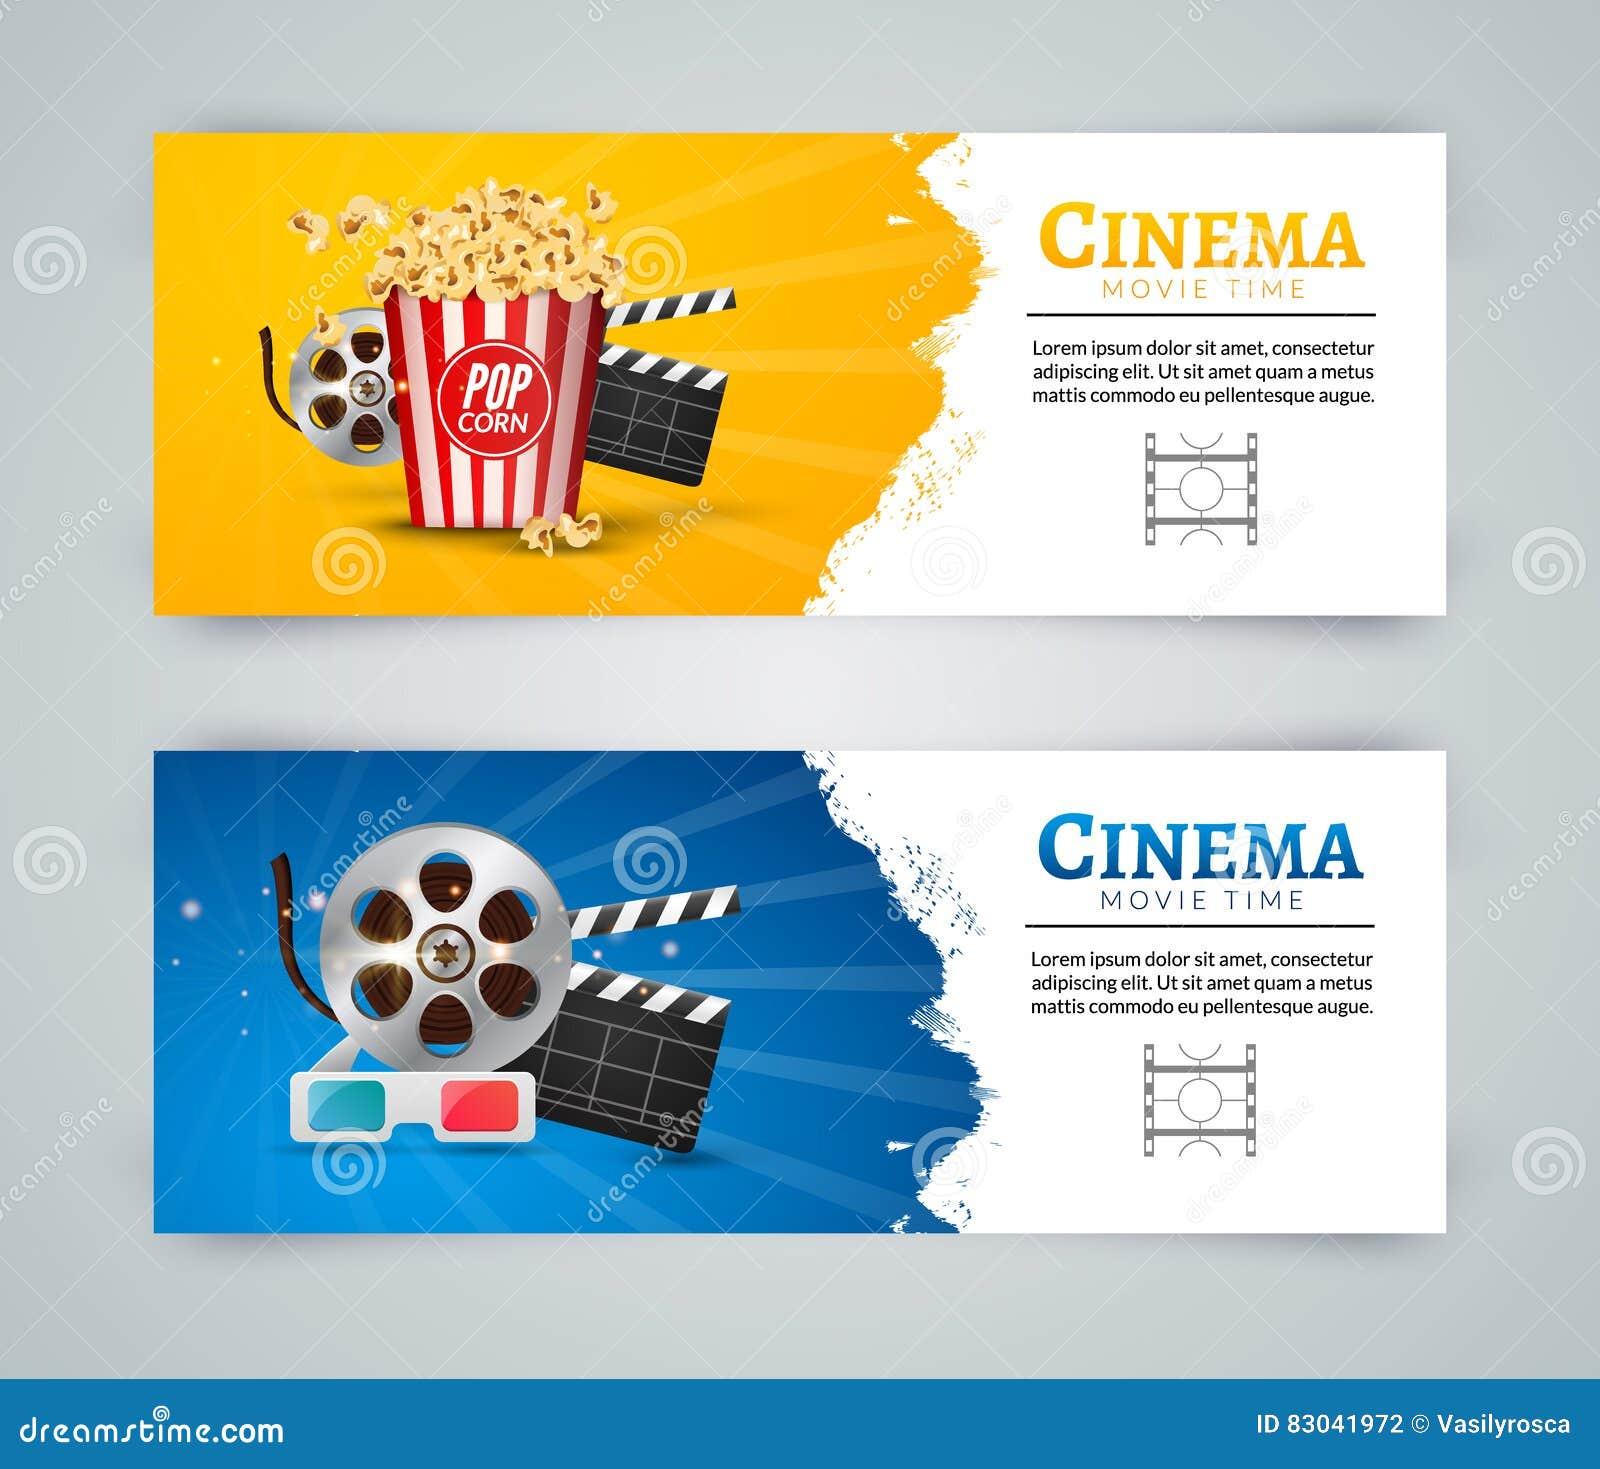 Poster design template free - Banner Clapper Design Film Glasses Movie Popcorn Poster Template